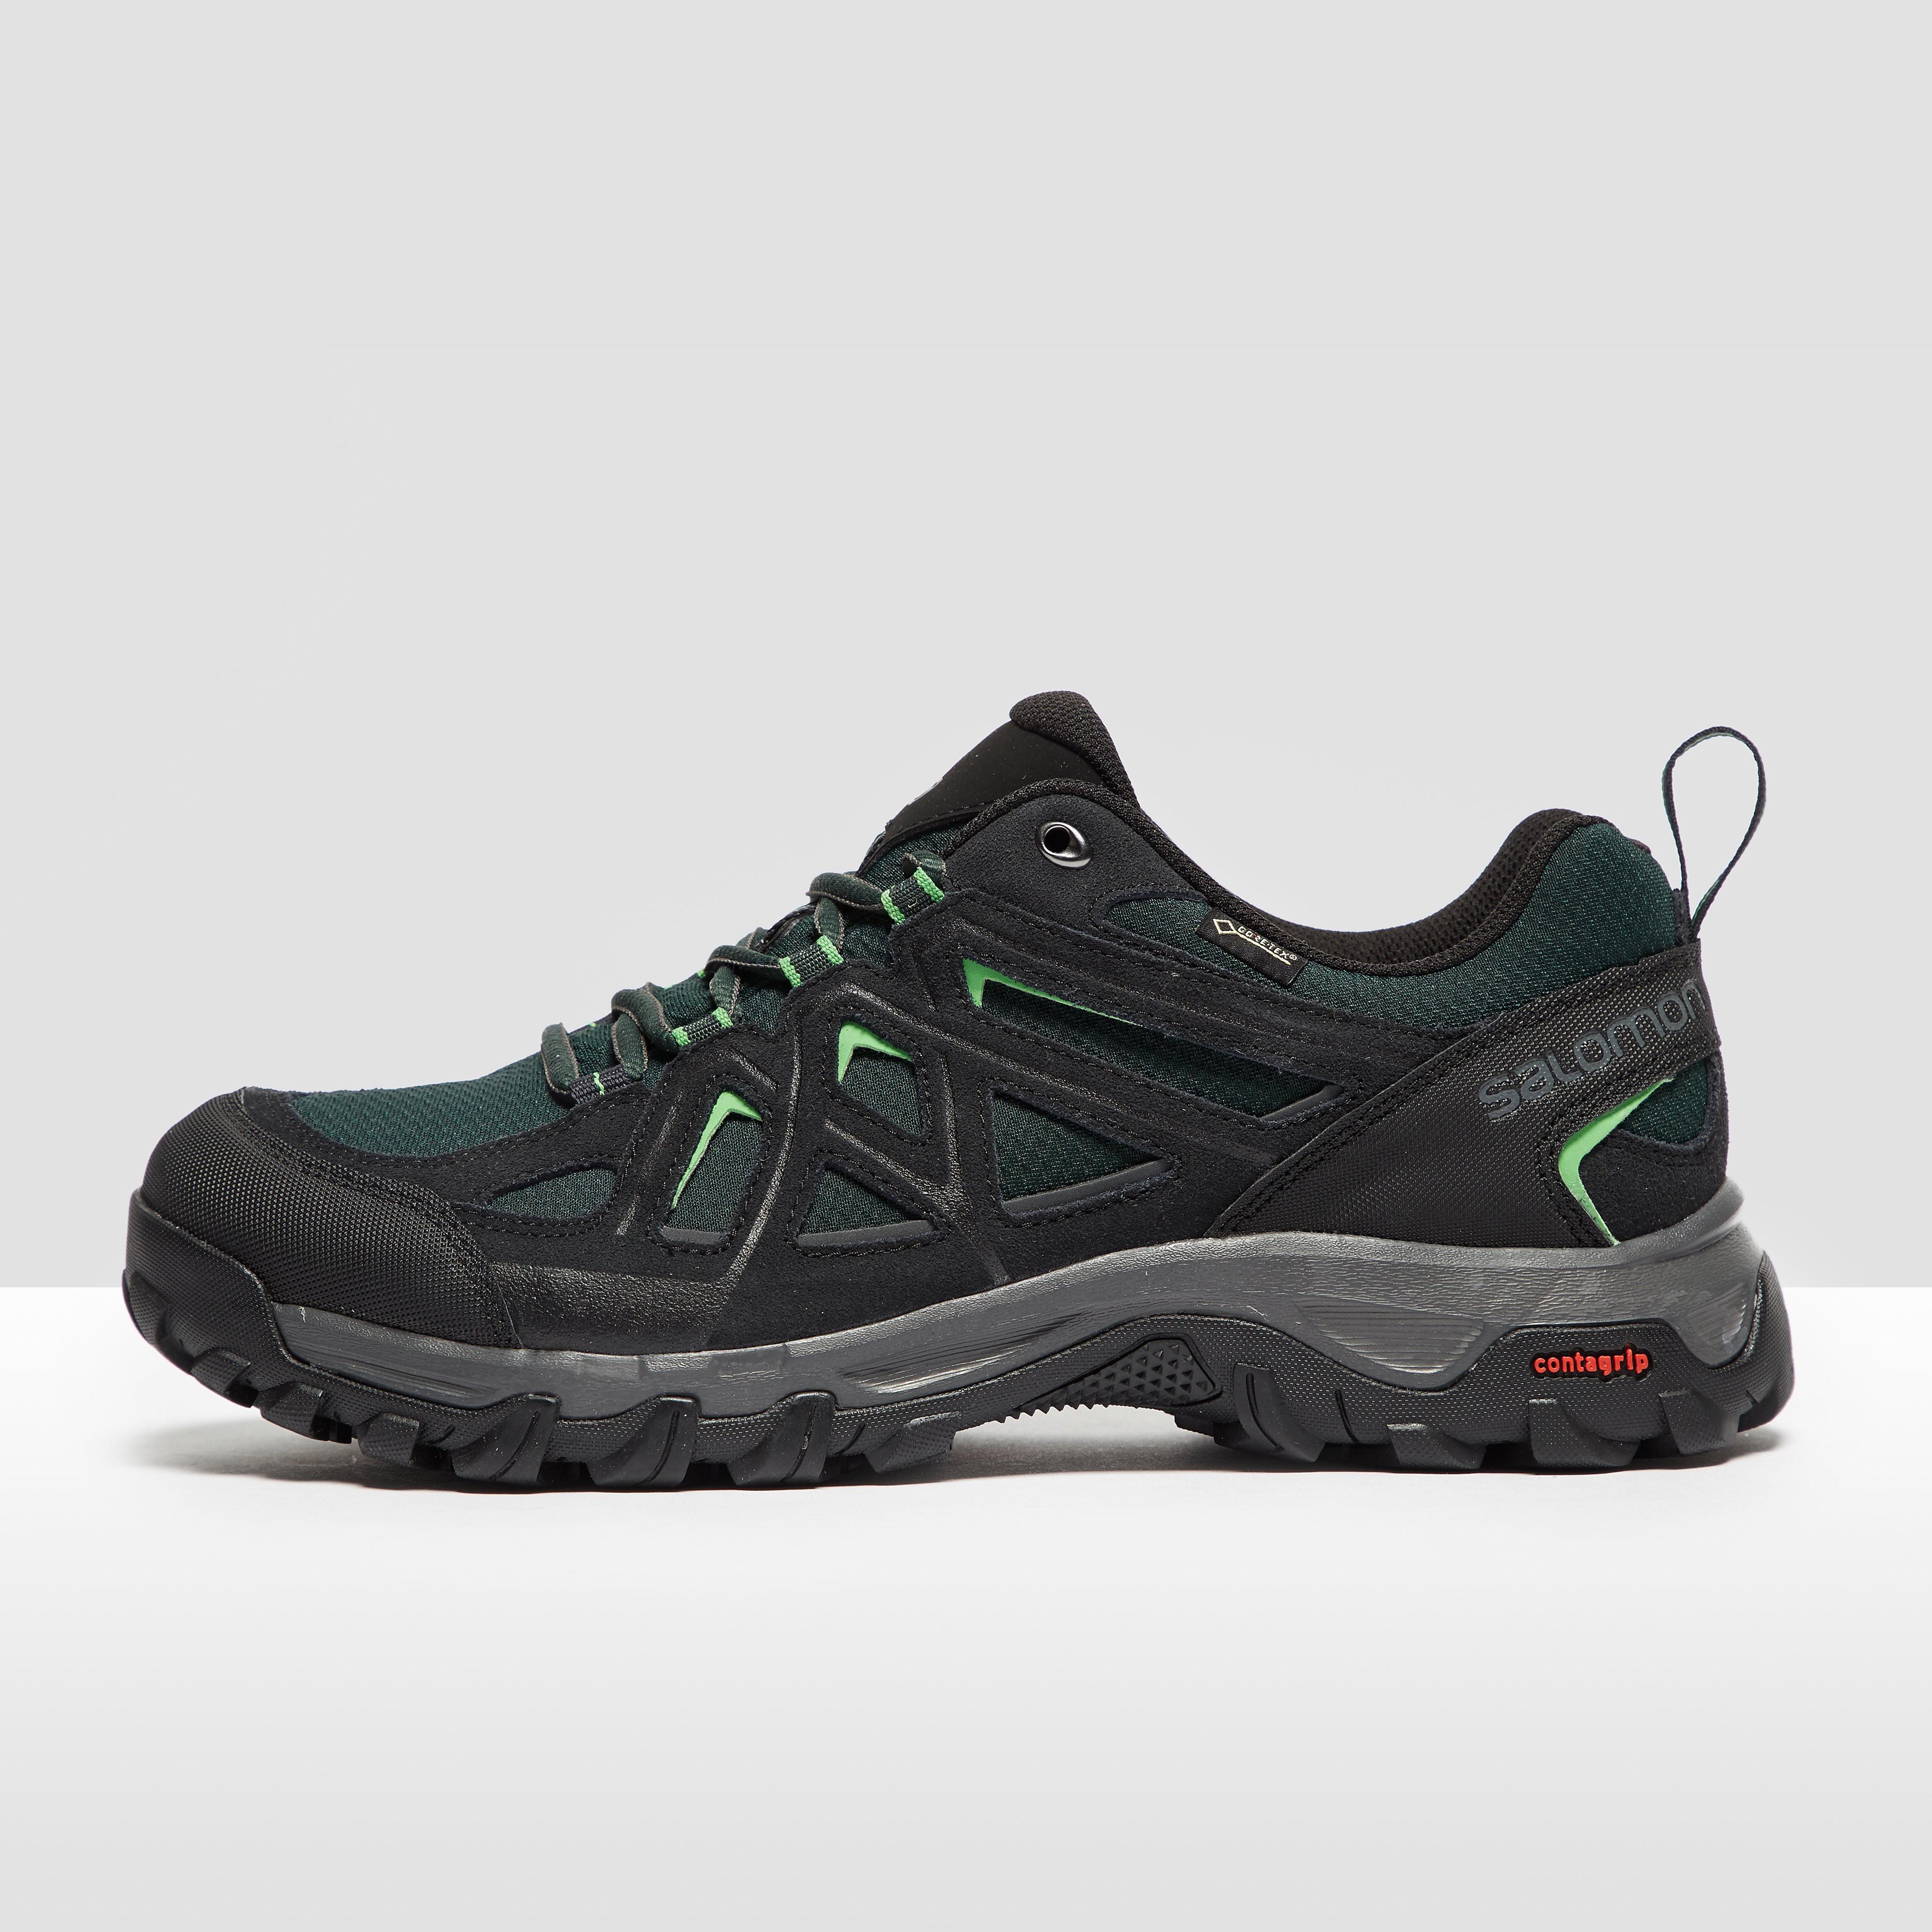 Salomon Evasion 2 Aero GTX Men's Walking Shoes